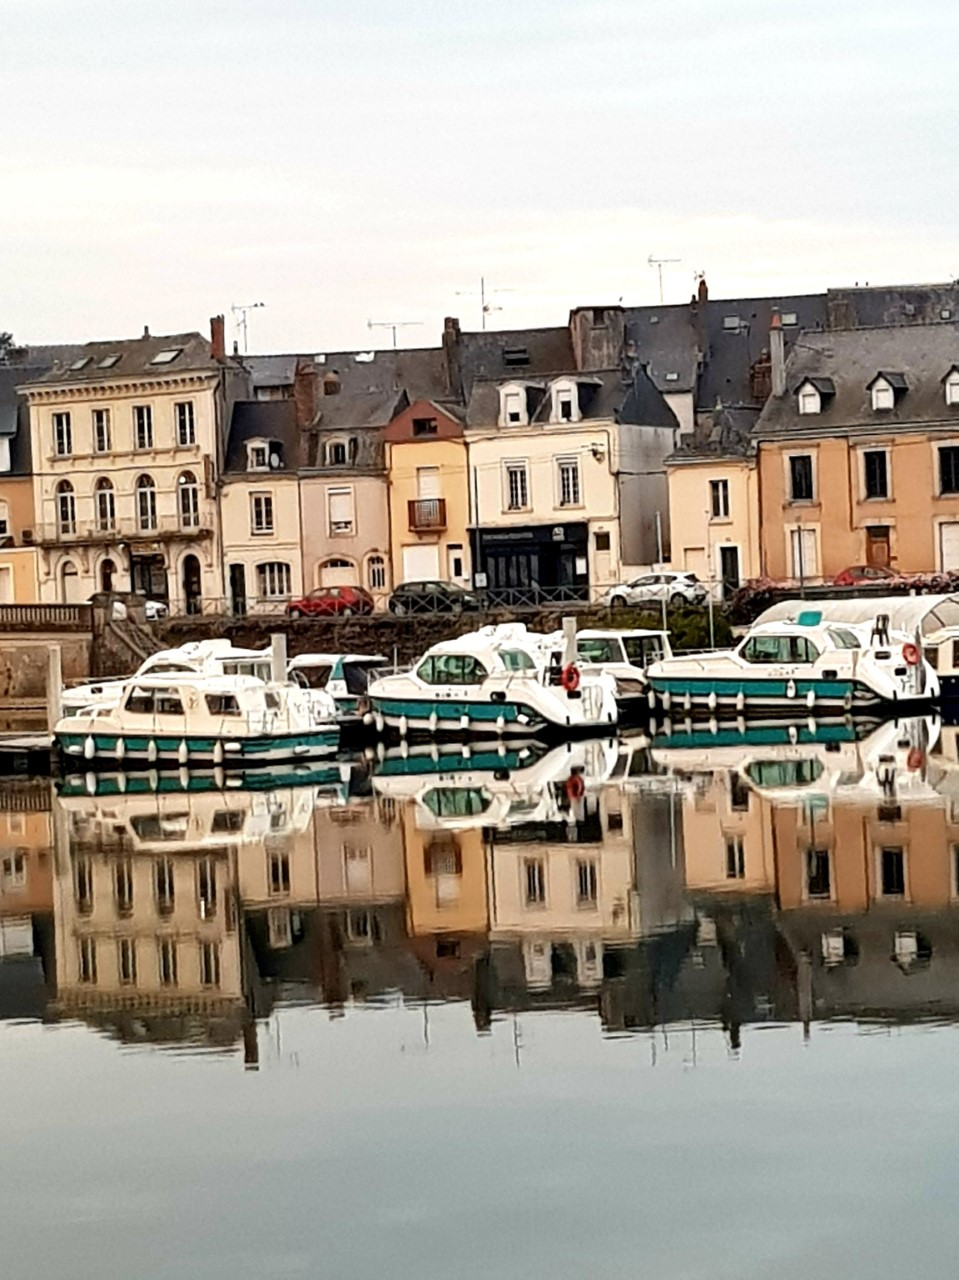 Le Port de Sablé by Sara Do.jpg